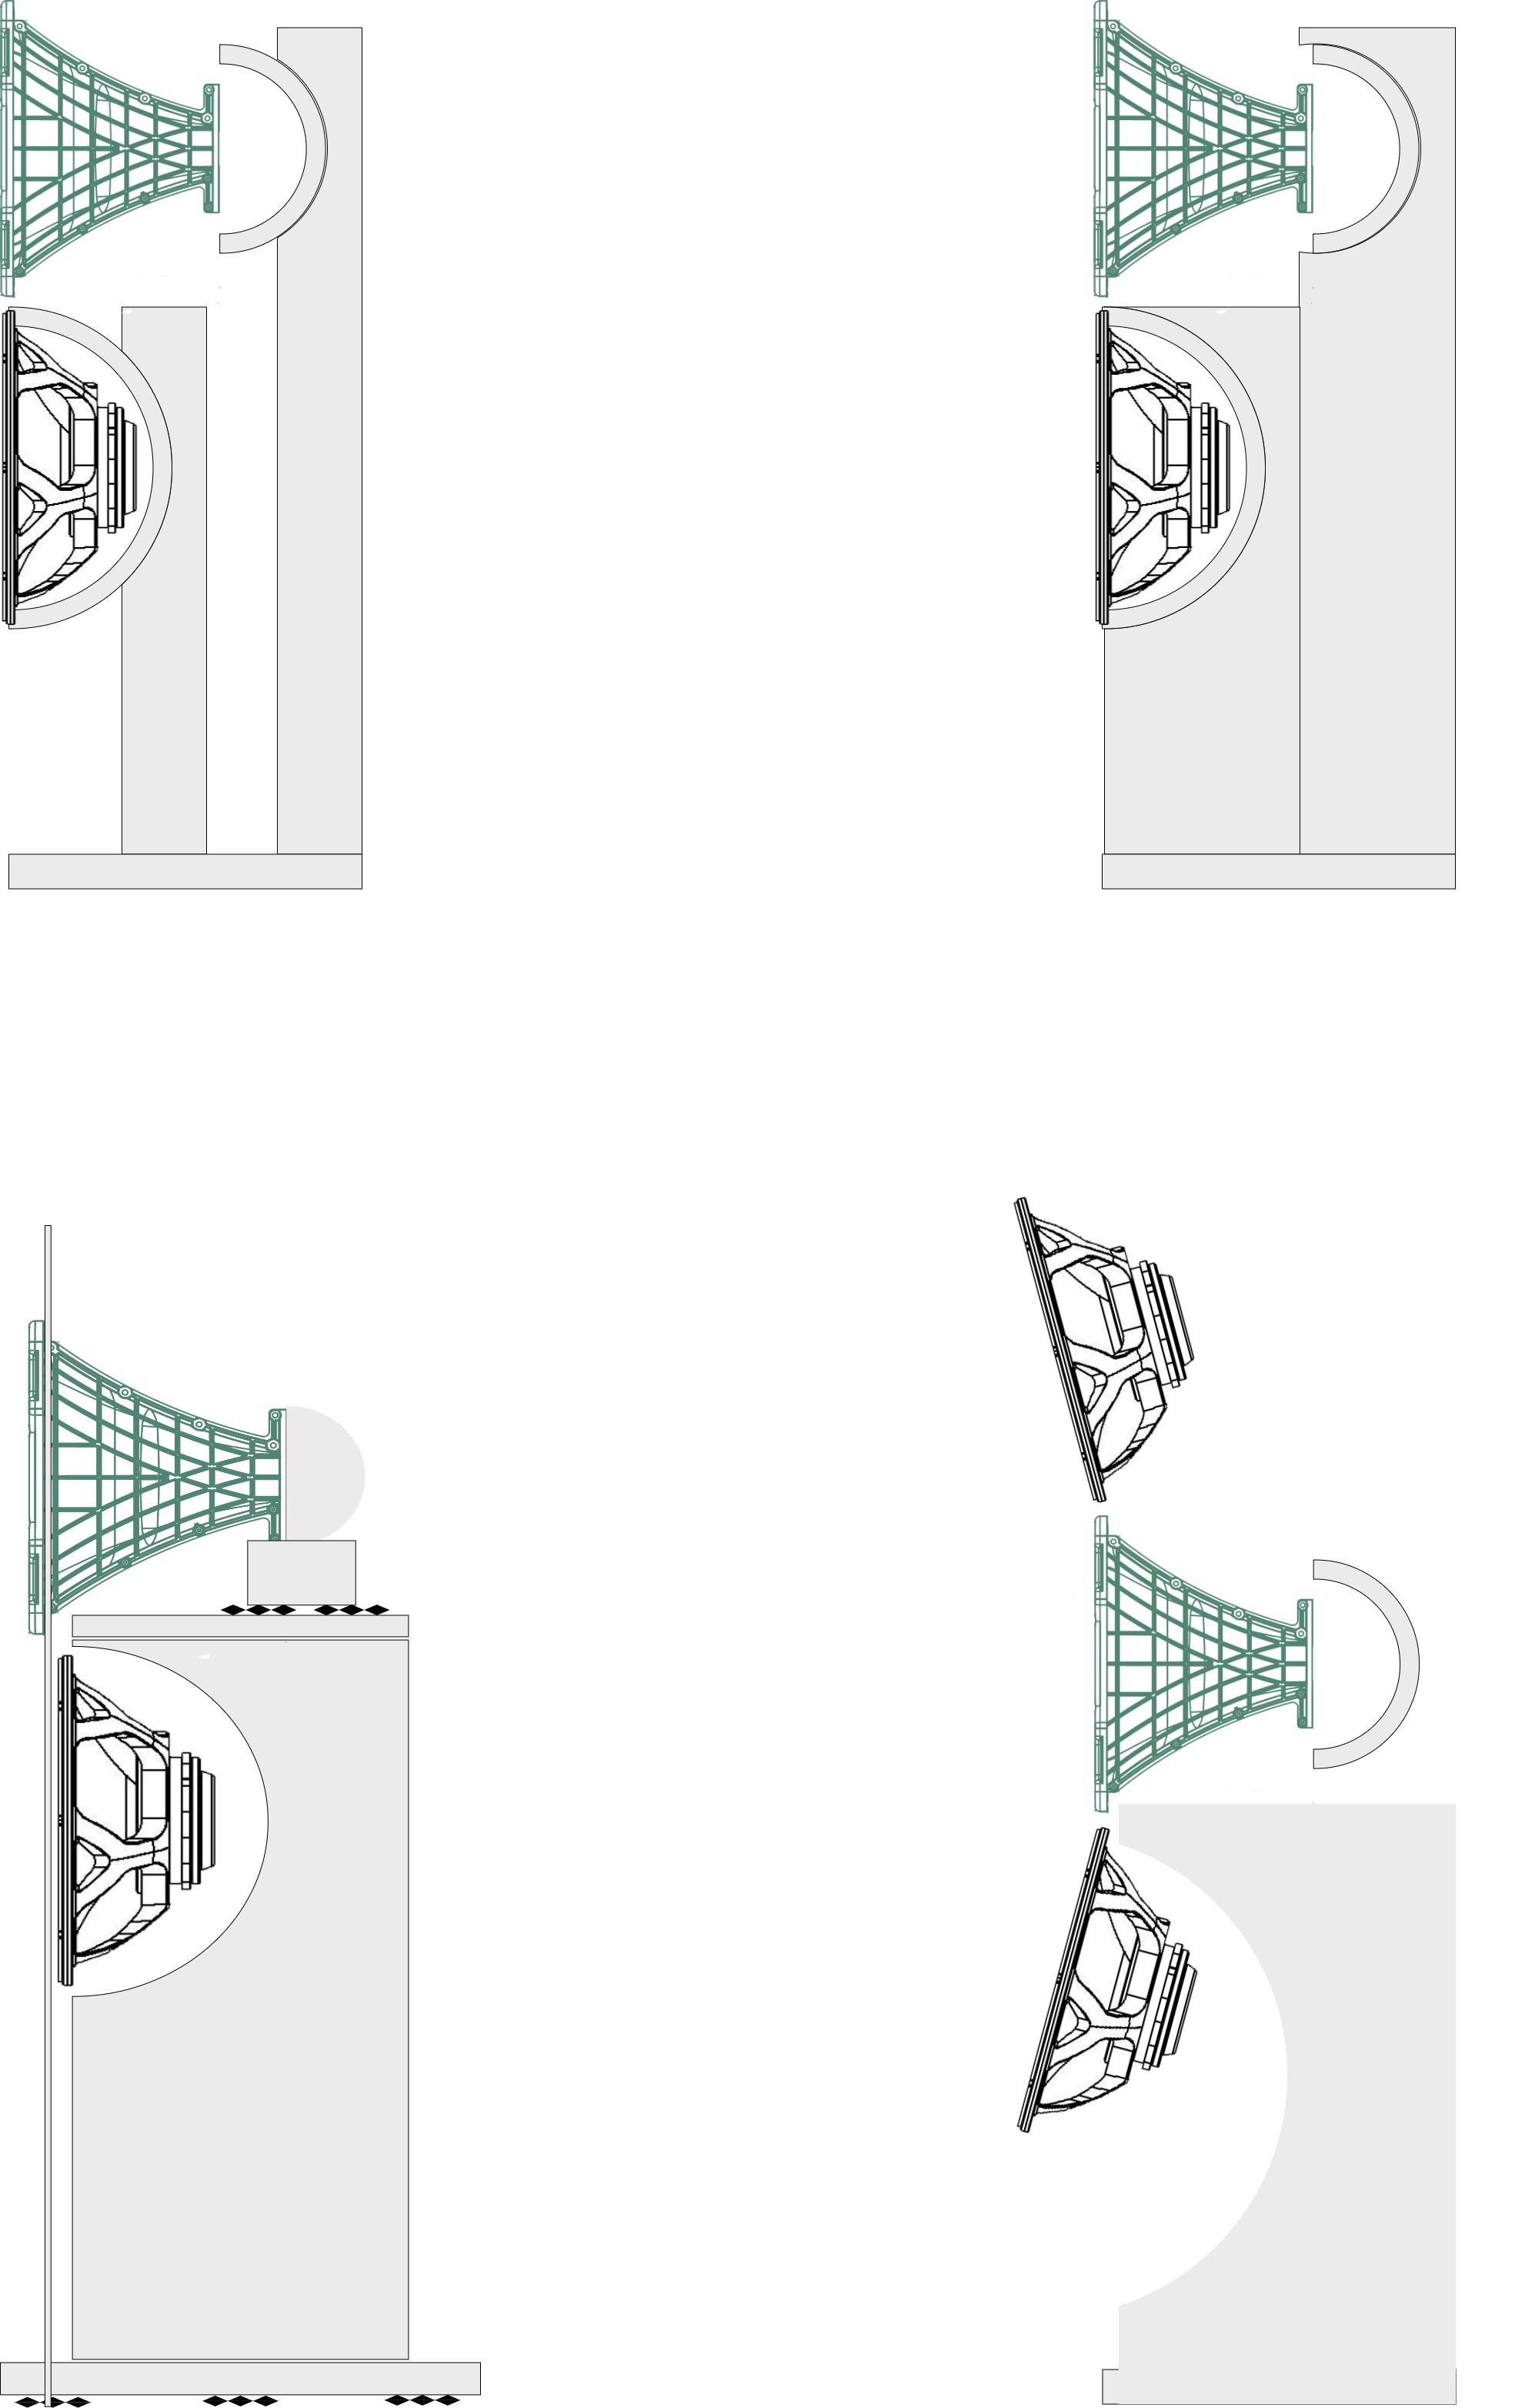 Different construction ideas